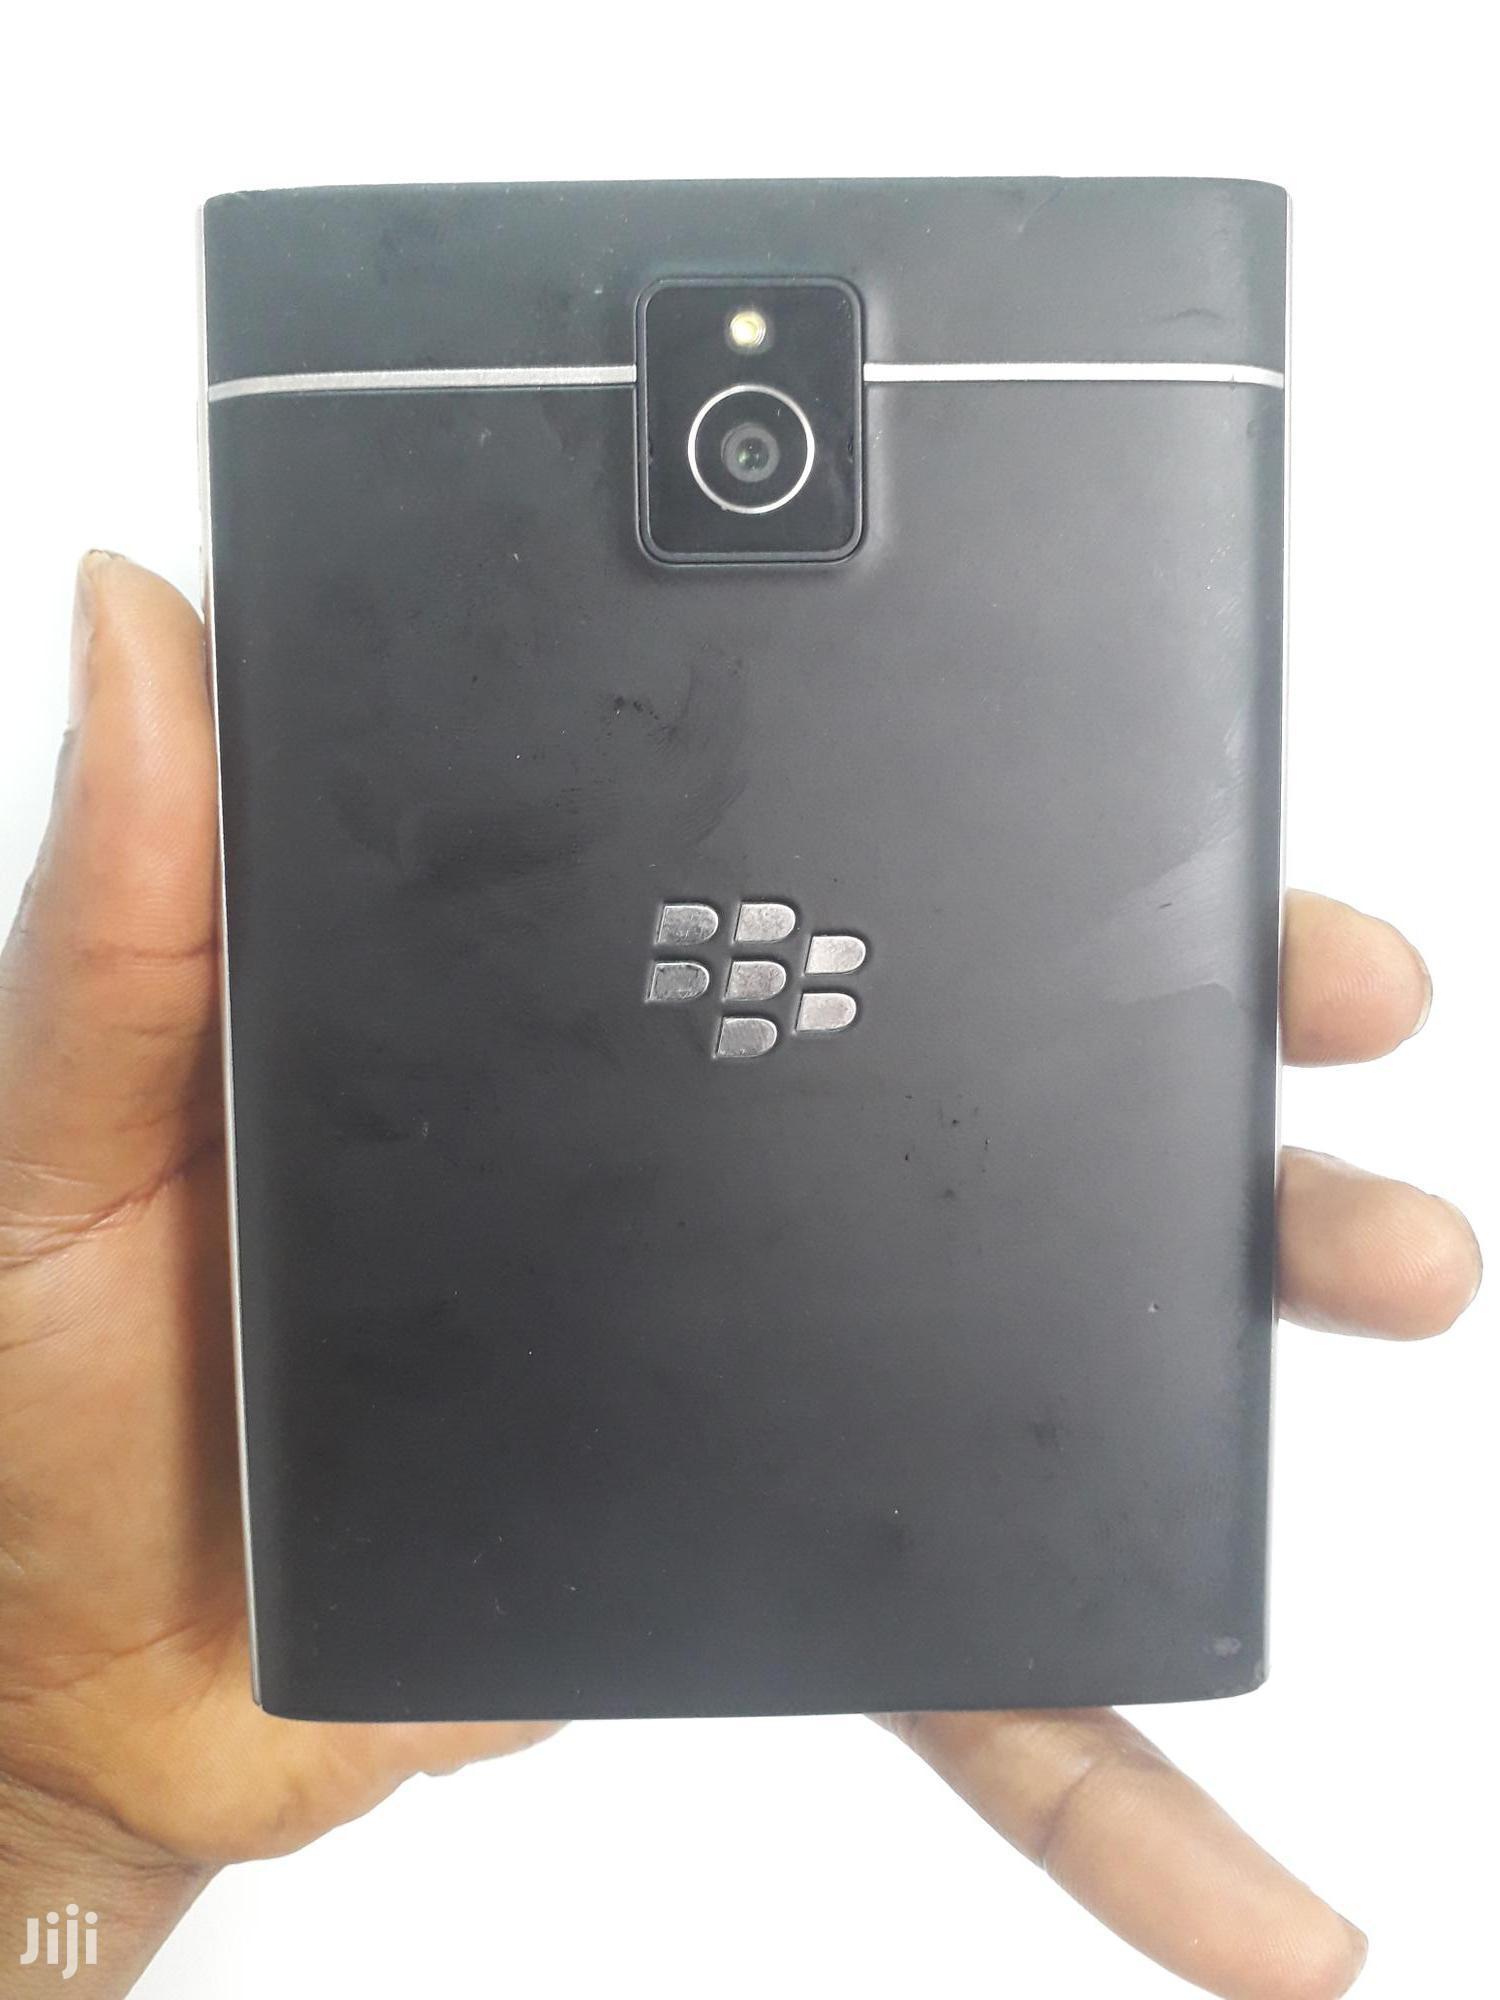 BlackBerry Passport 32 GB Black | Mobile Phones for sale in Ikeja, Lagos State, Nigeria